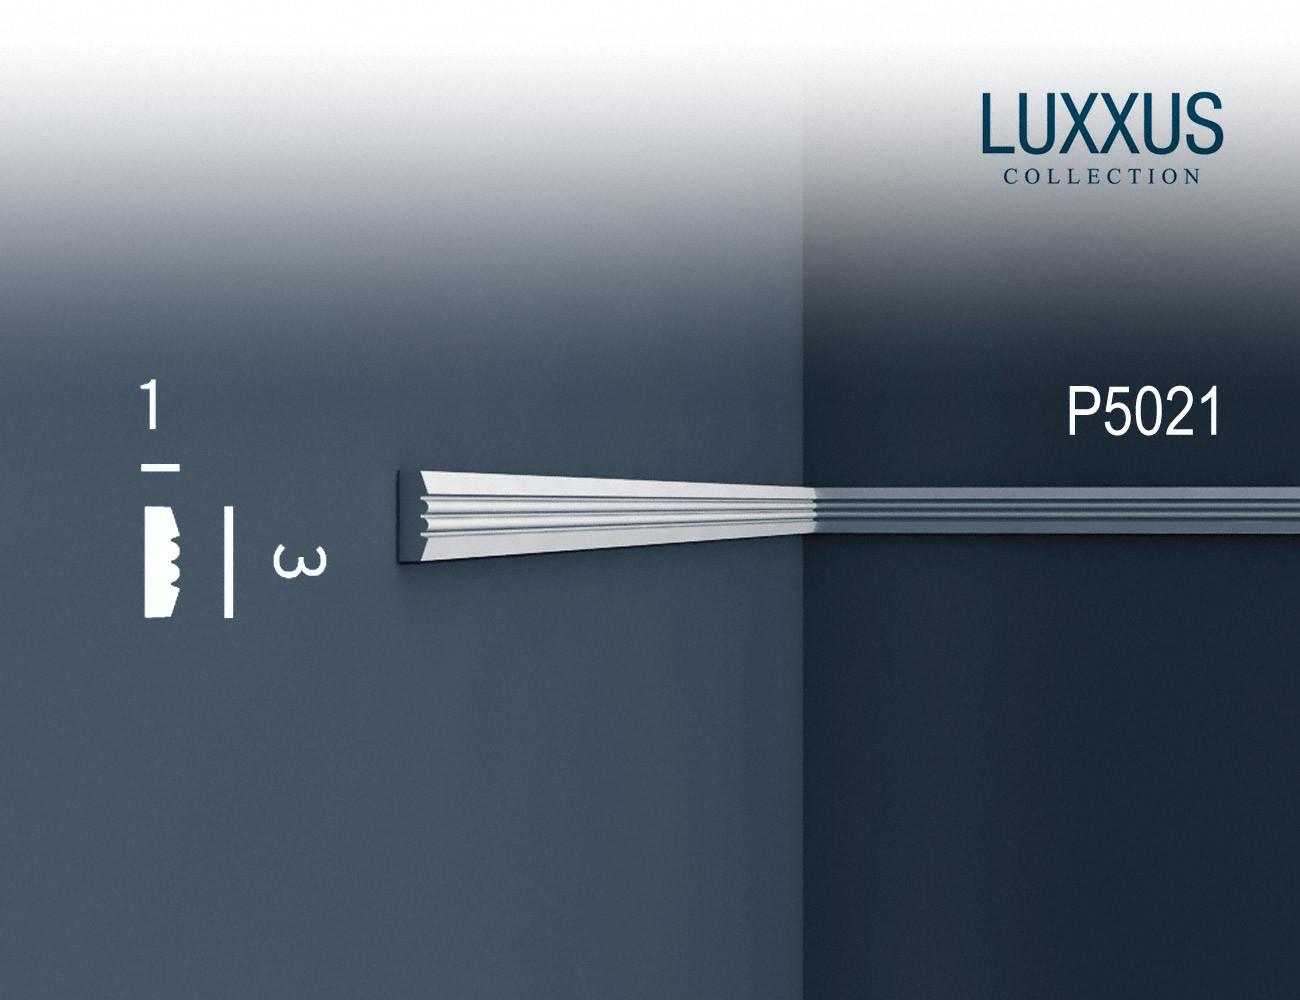 Element Decorativ Luxxus P5021 Orac Decor